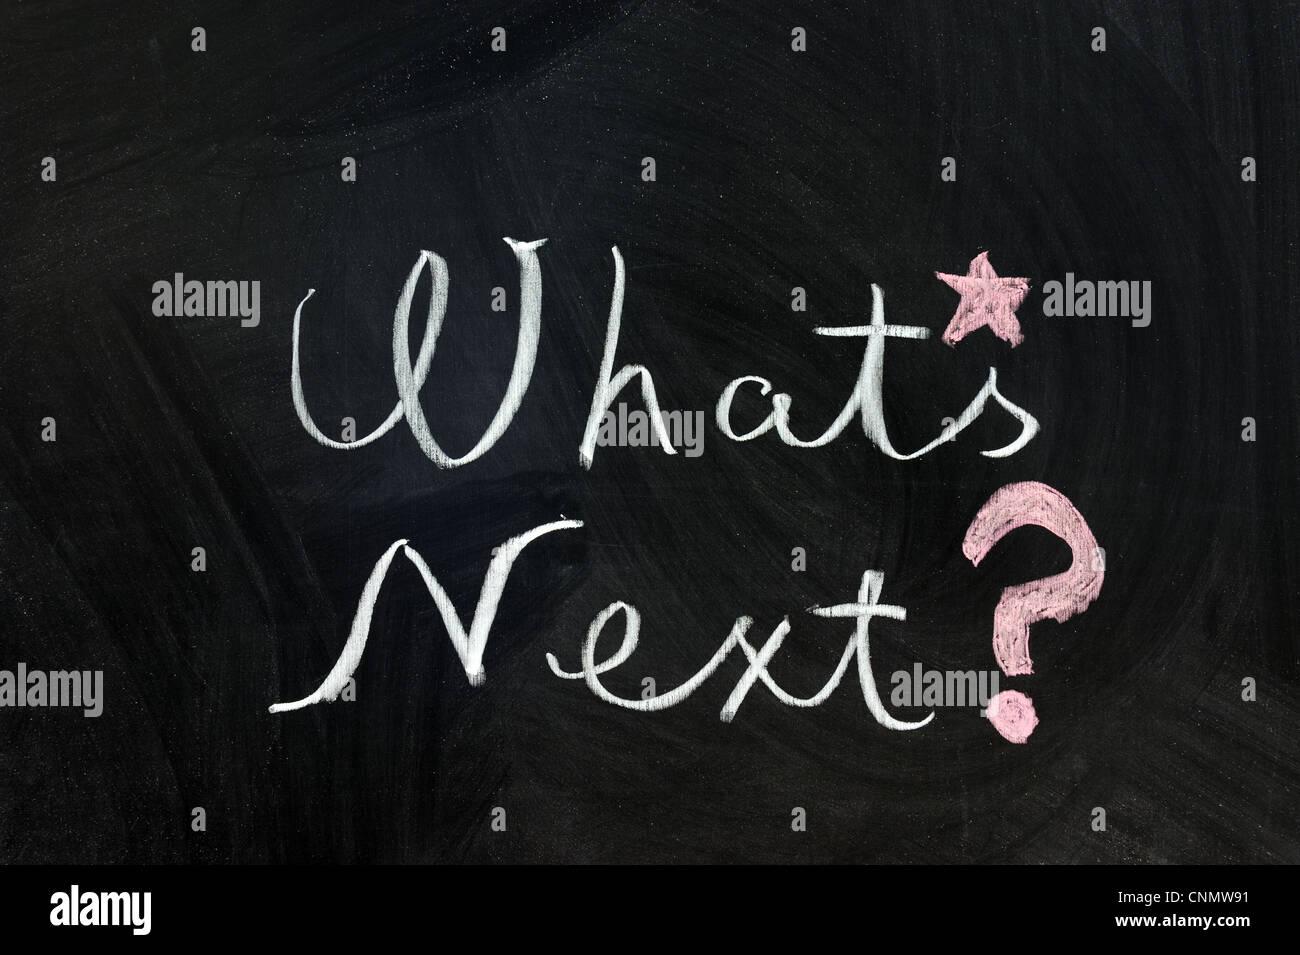 Chalk writing - What's next words written on chalkboard Stock Photo